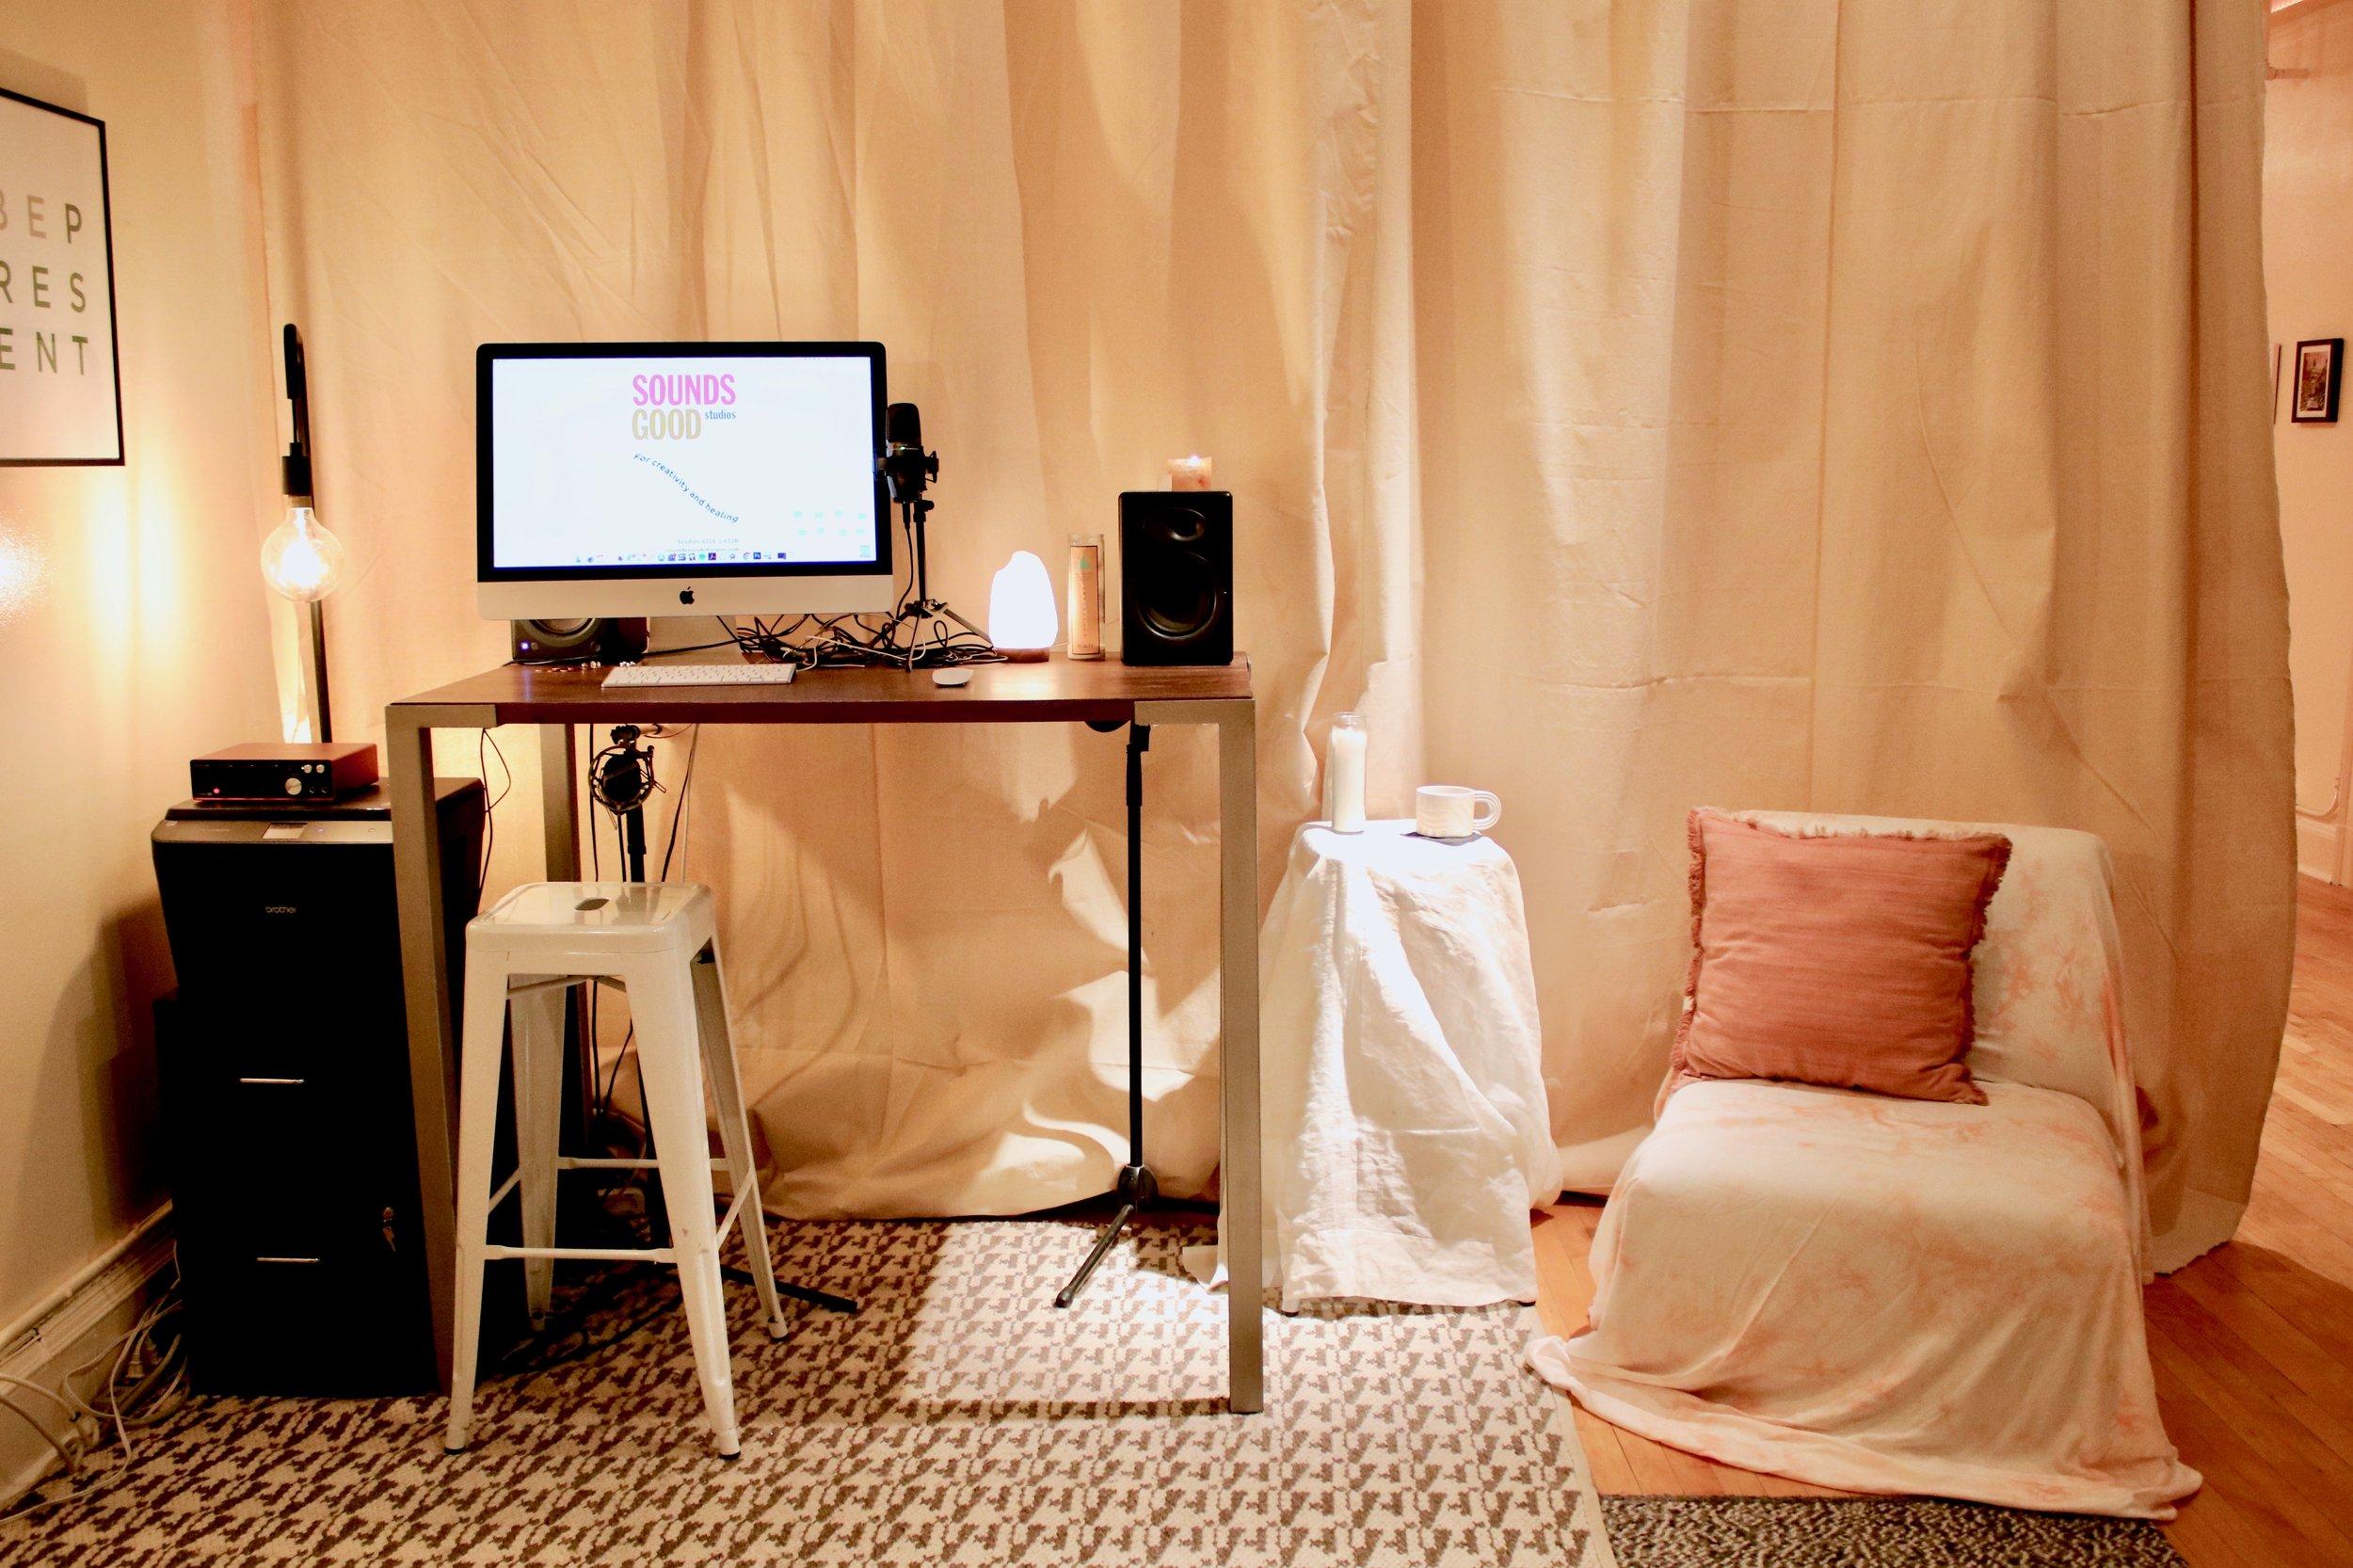 Sounds_good_studios_chicago_b_4.jpg